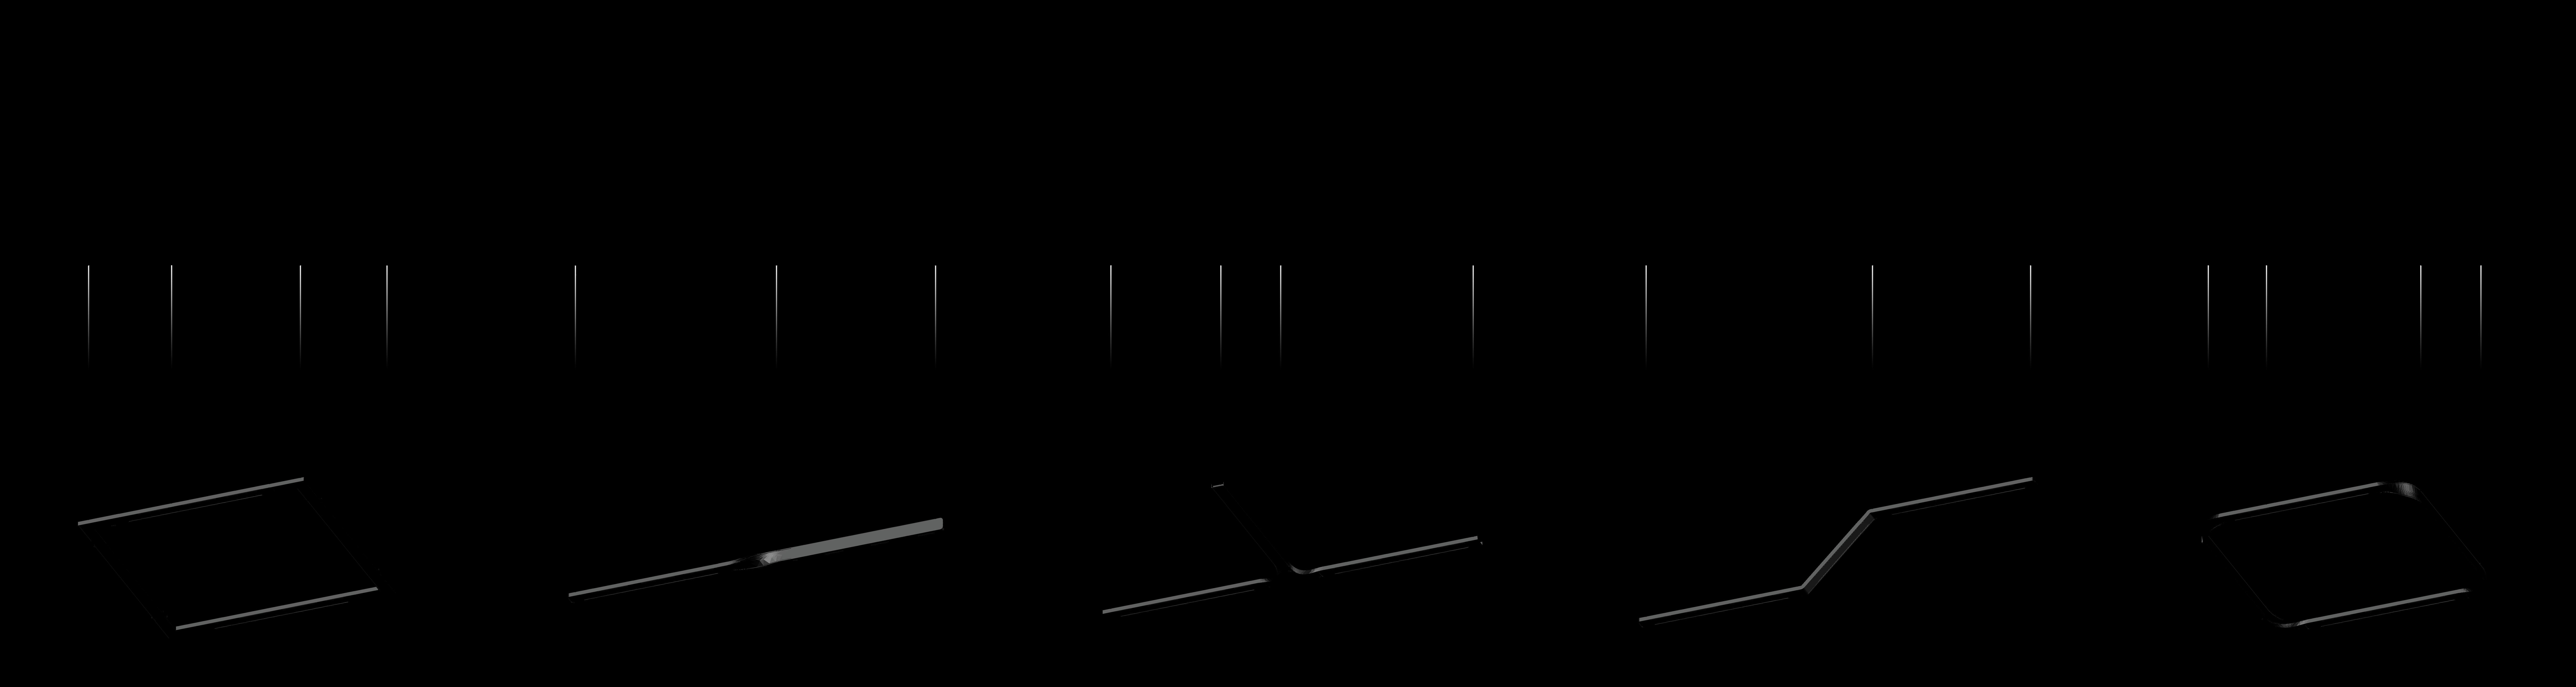 RennaBasicConfigurations-Grouping-Details-no background